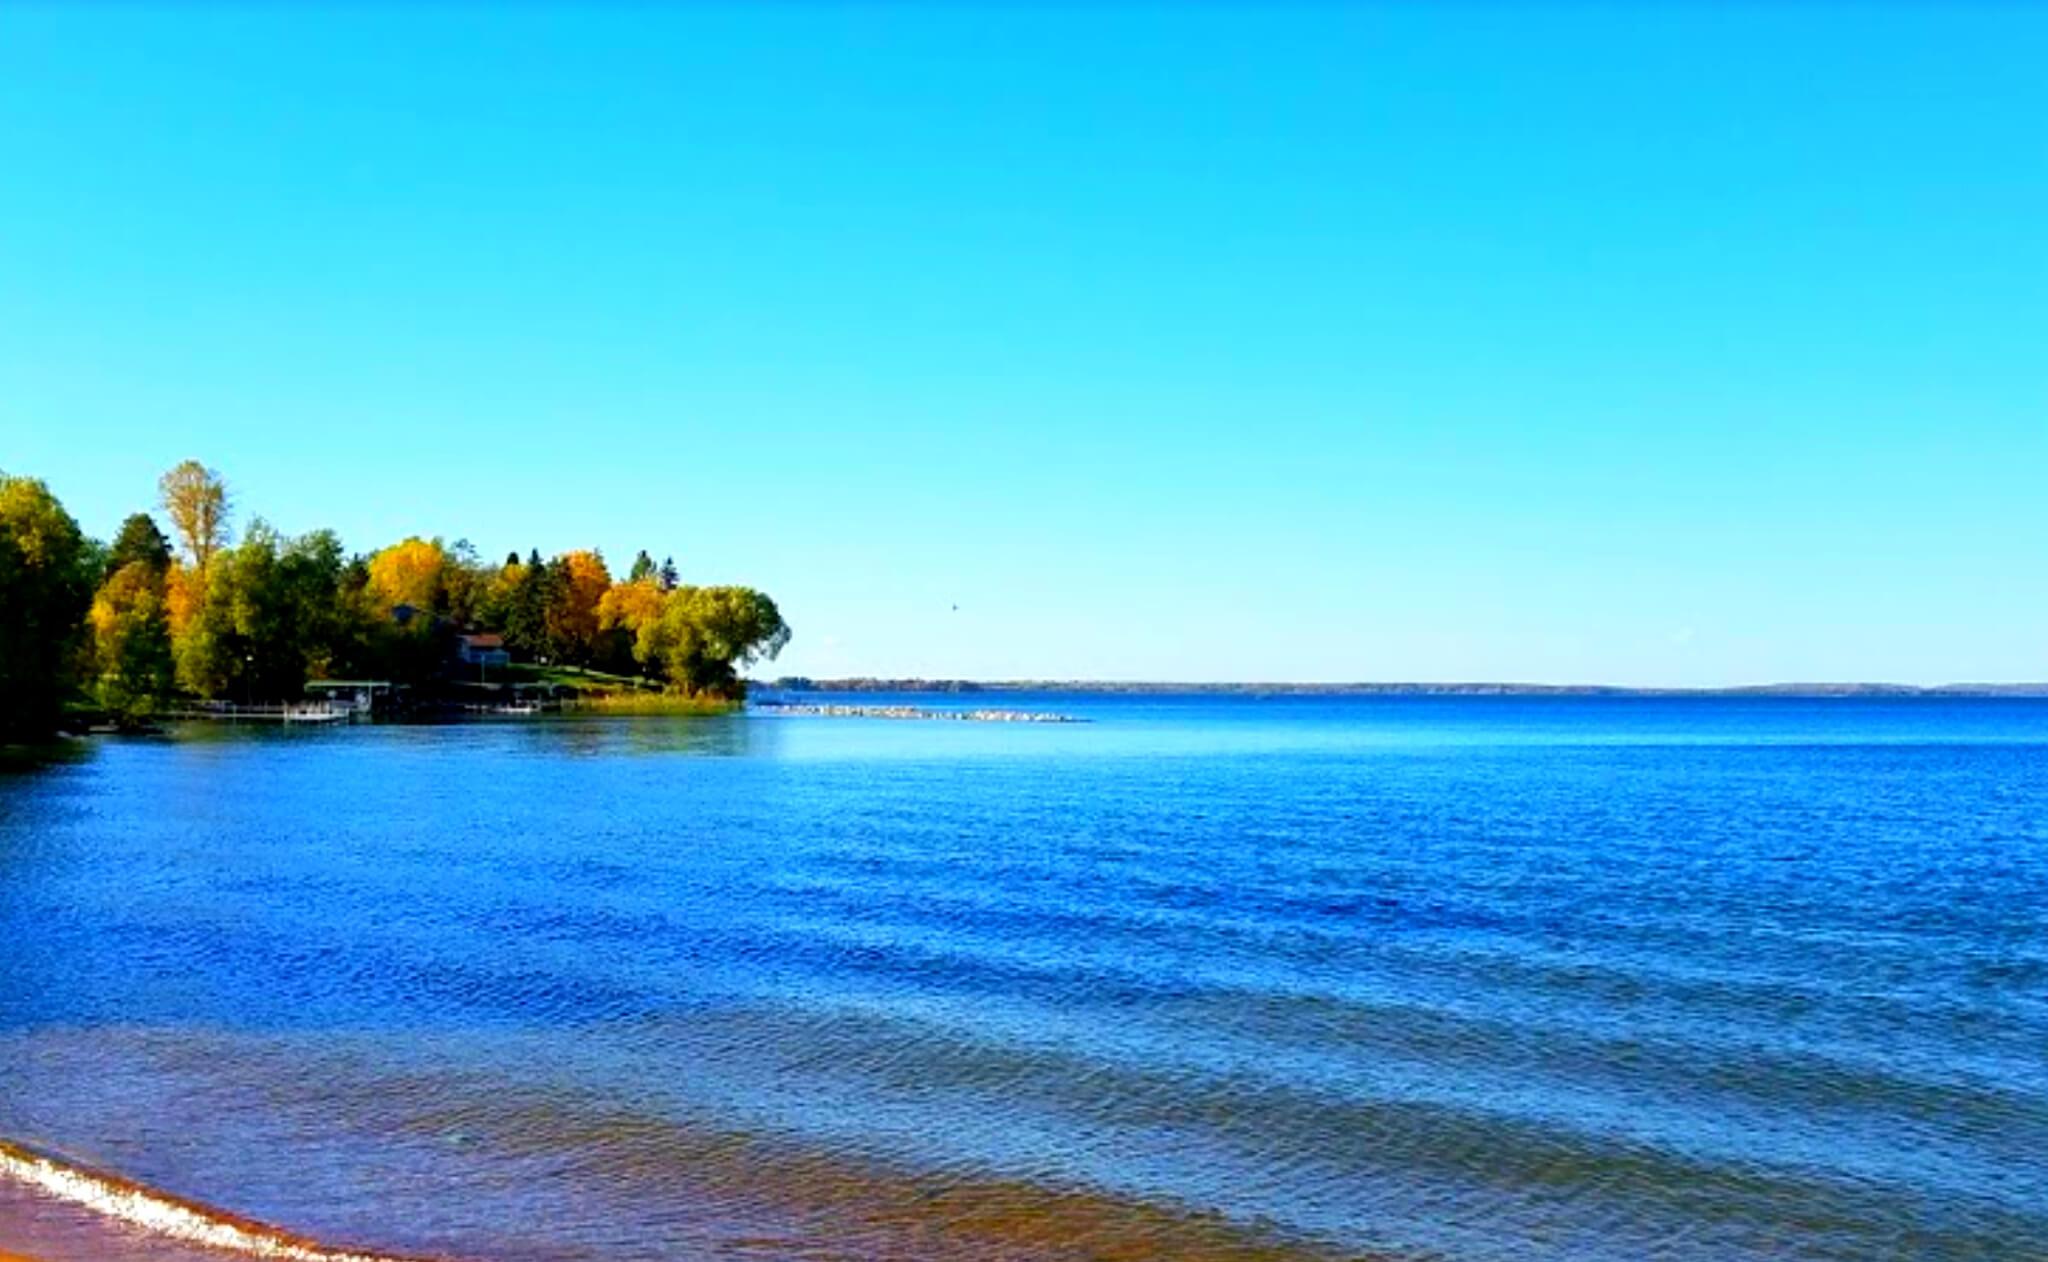 Leech-Lake-Fishing-Report-Guide-Minnesota-MN-03-1